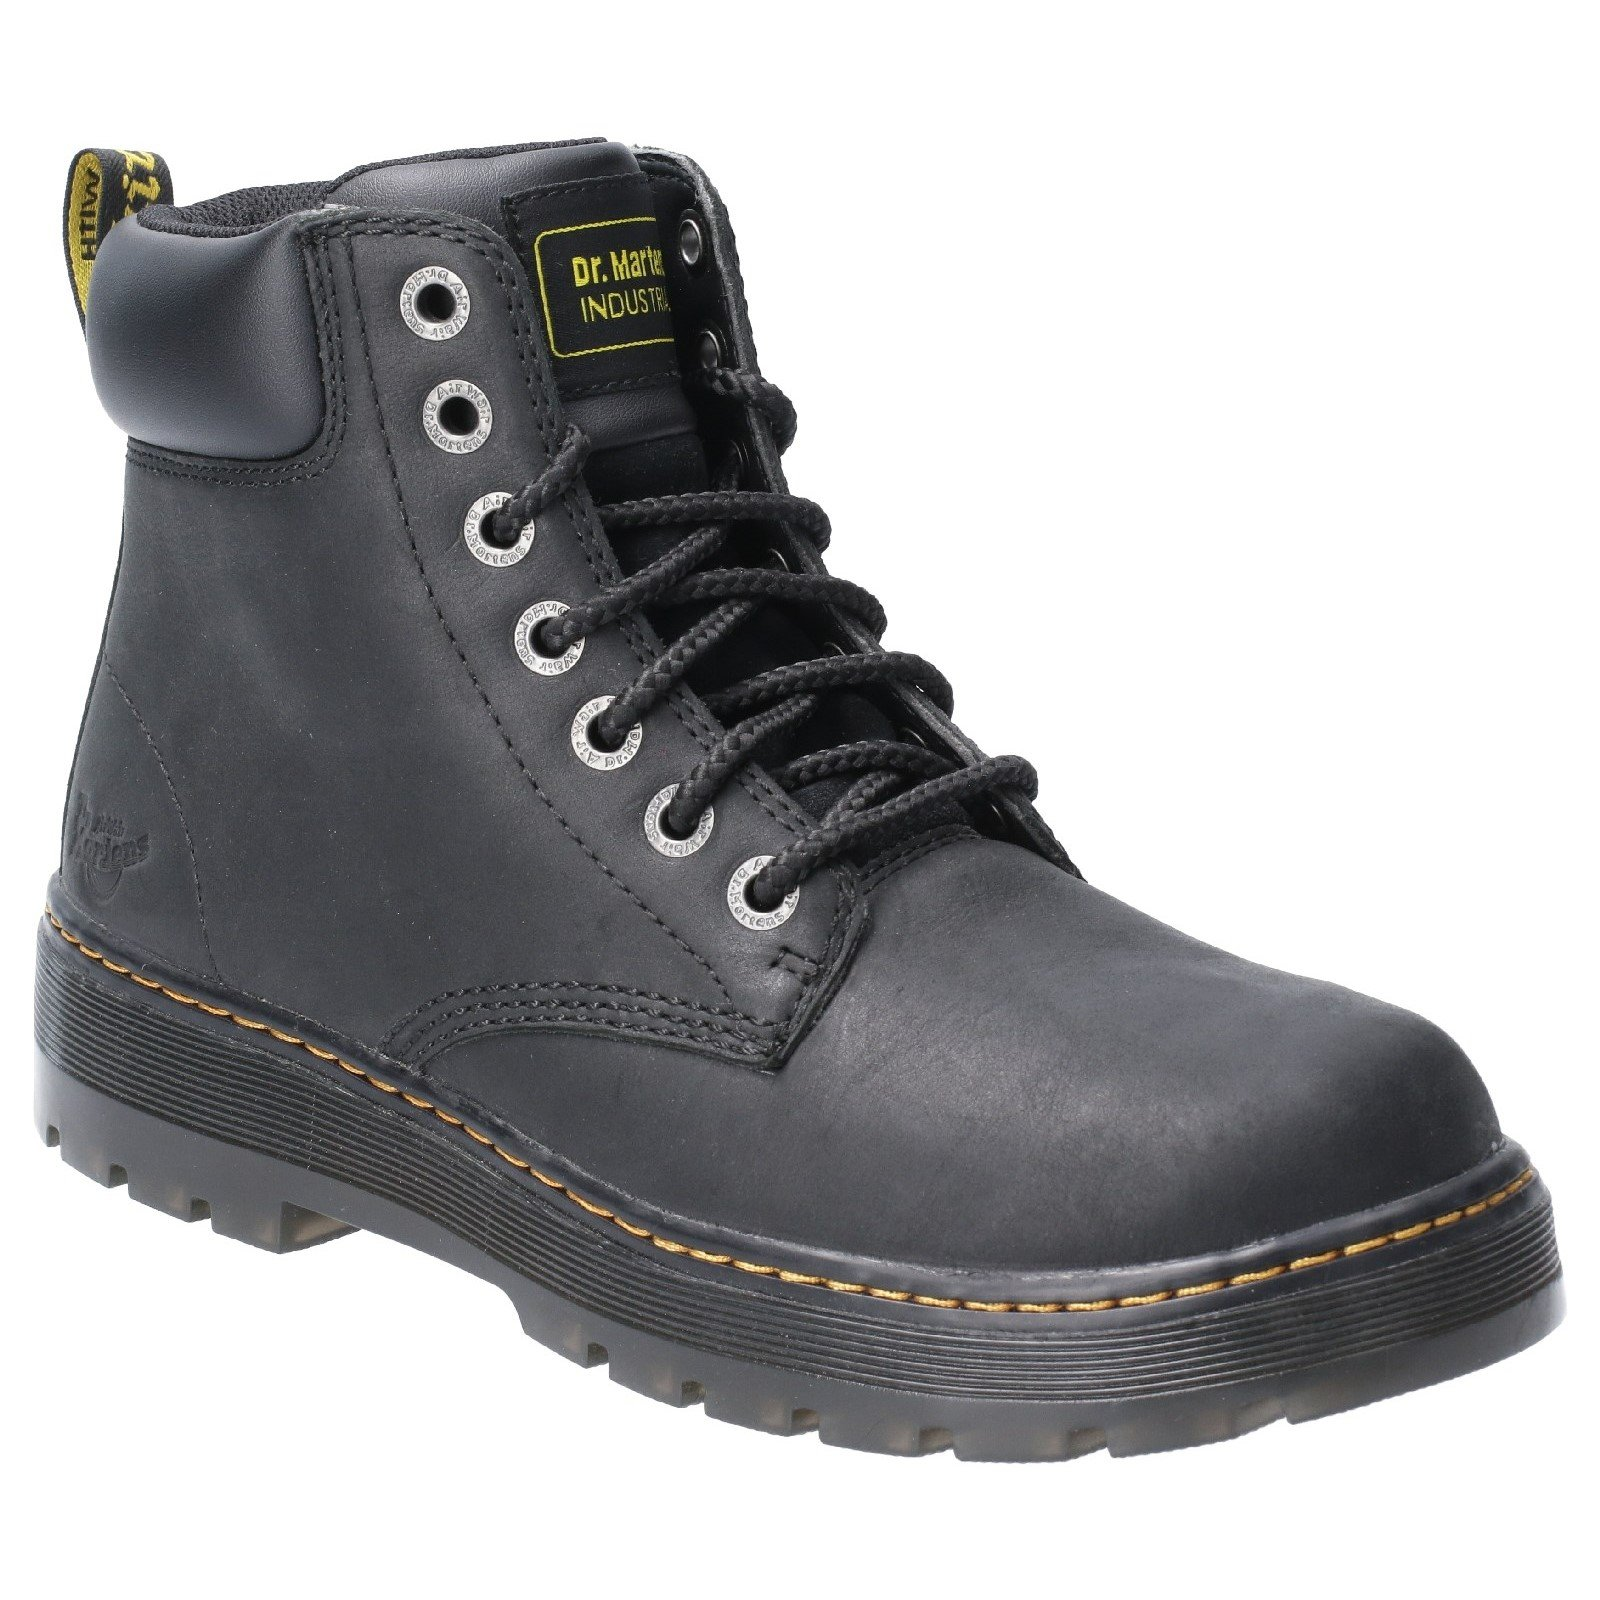 Dr Martens Men's Winch Non-Safety Work Boot Black 29821 - Black 9